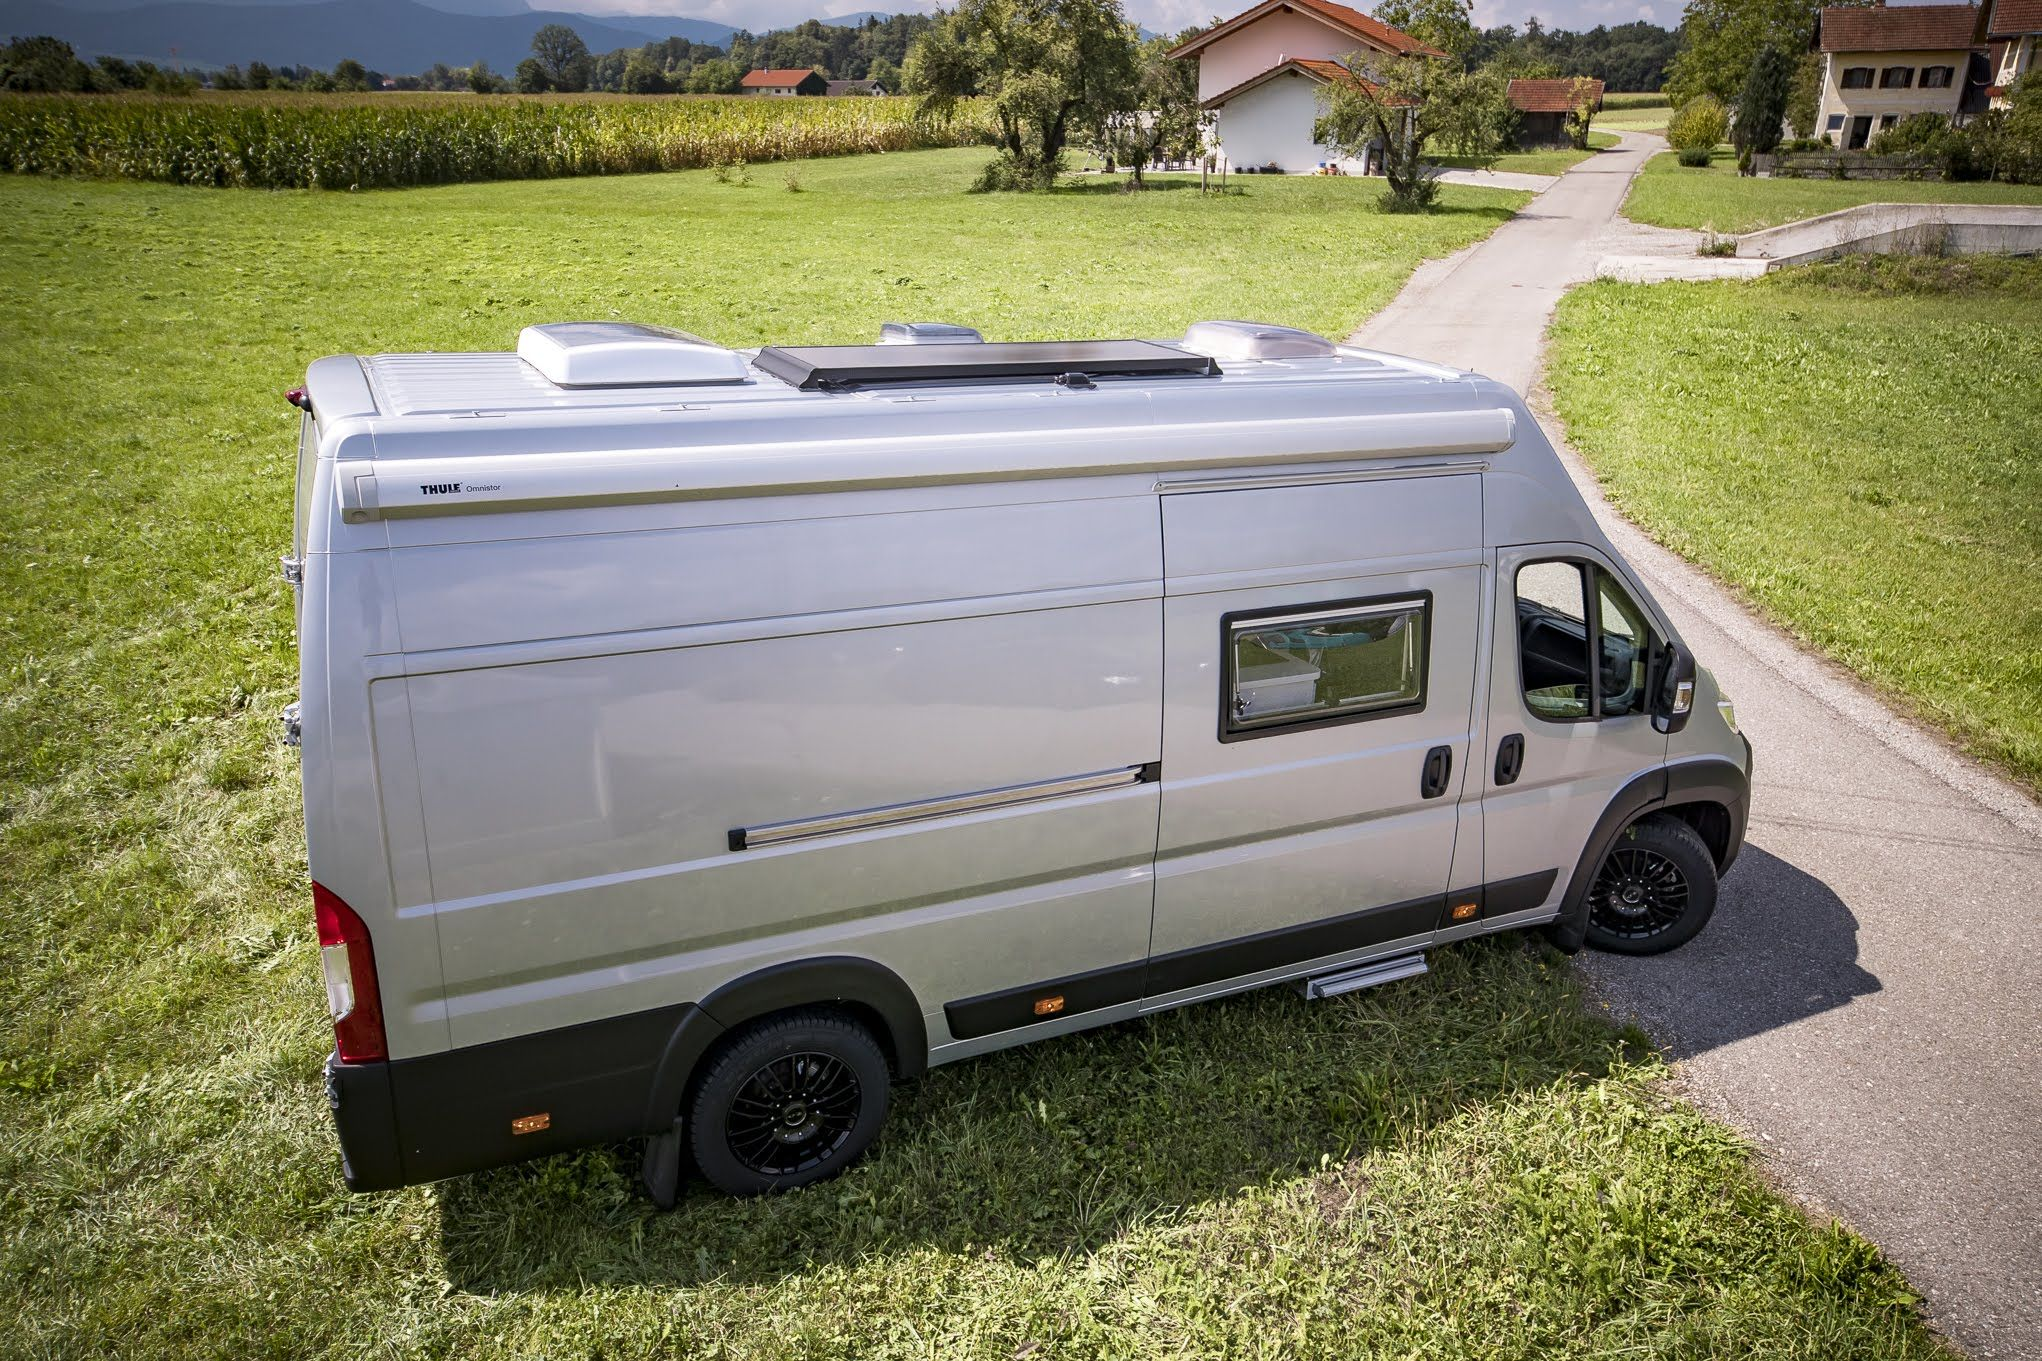 VR Sonderkfz Werkstattfahrzeug Mehrzweckfahrzeug - VR-Motorhomes